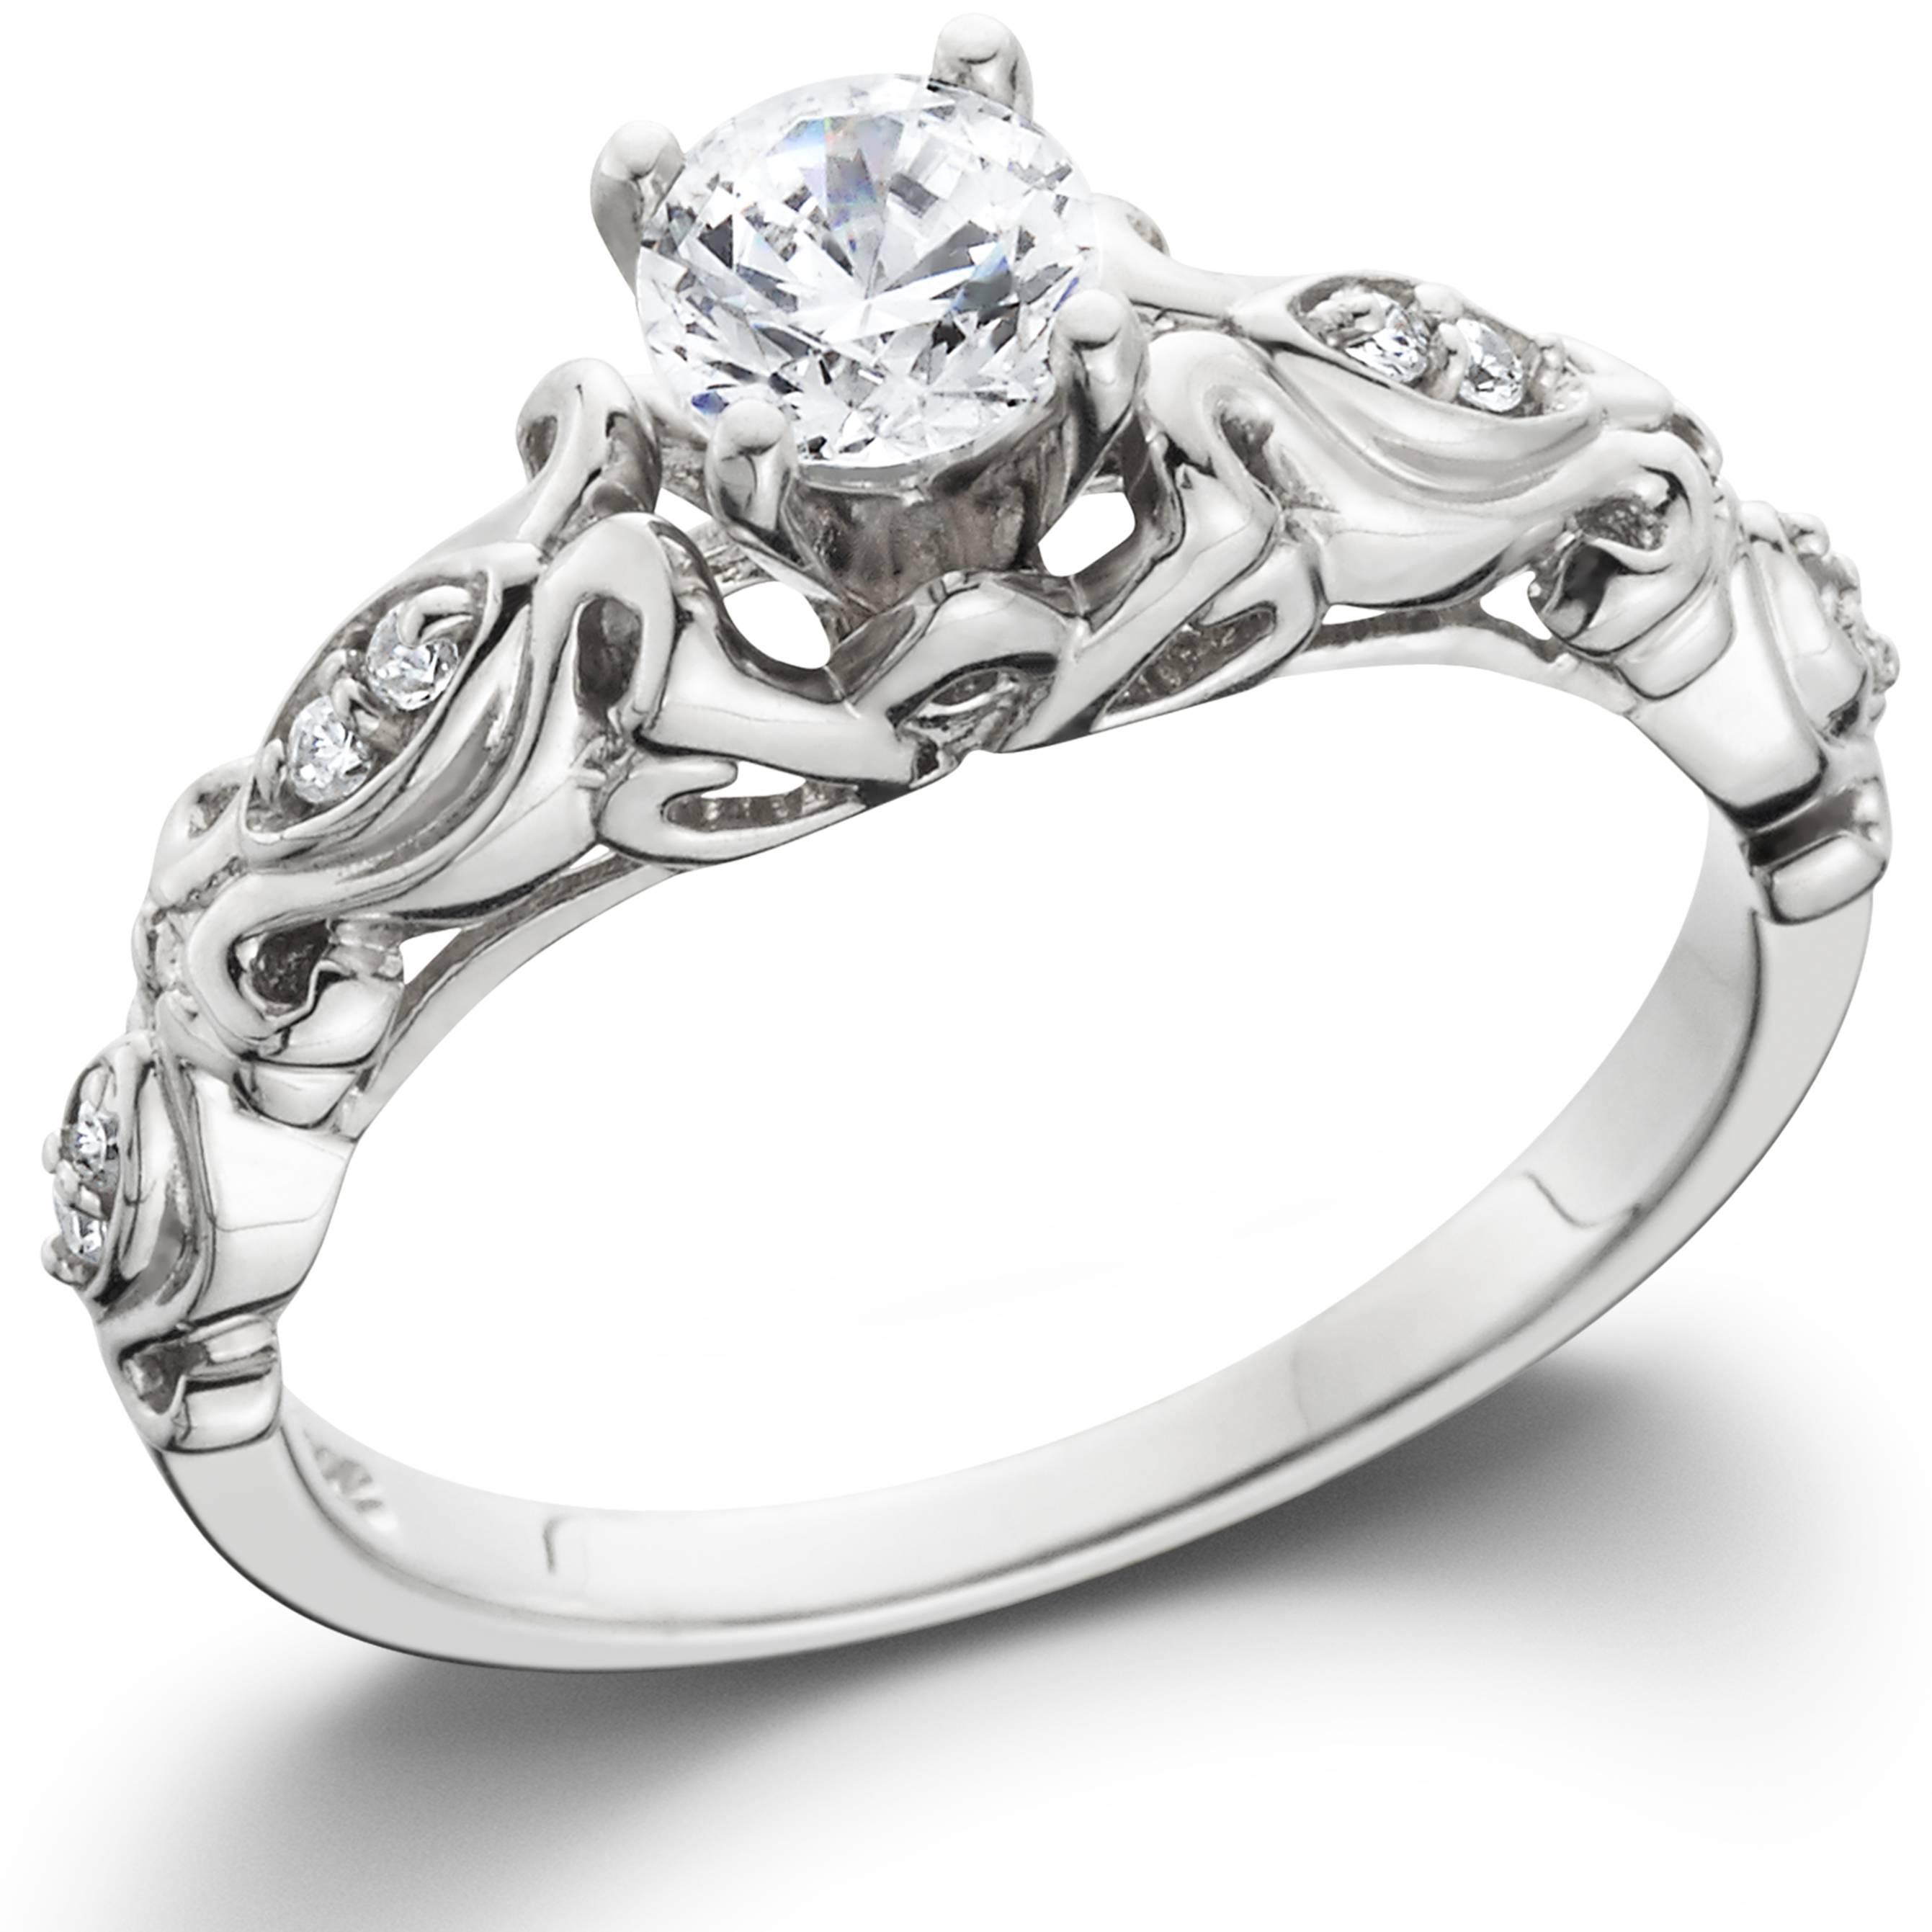 ebay wedding ring sets Thumb One